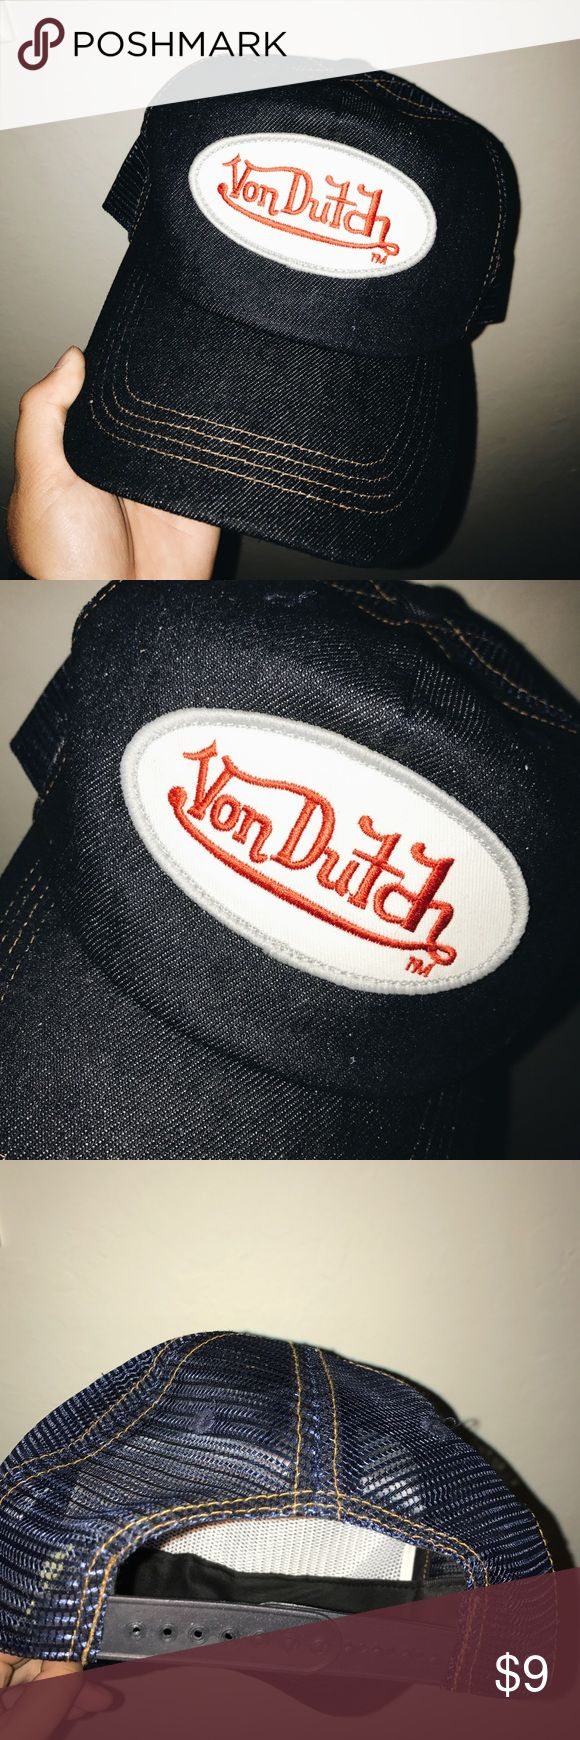 VON DUTCH Trucker Hat!! Cute & Stylish Von Dutch hat from UO!!! Please make questions // make offers (: Urban Outfitters Accessories Hats